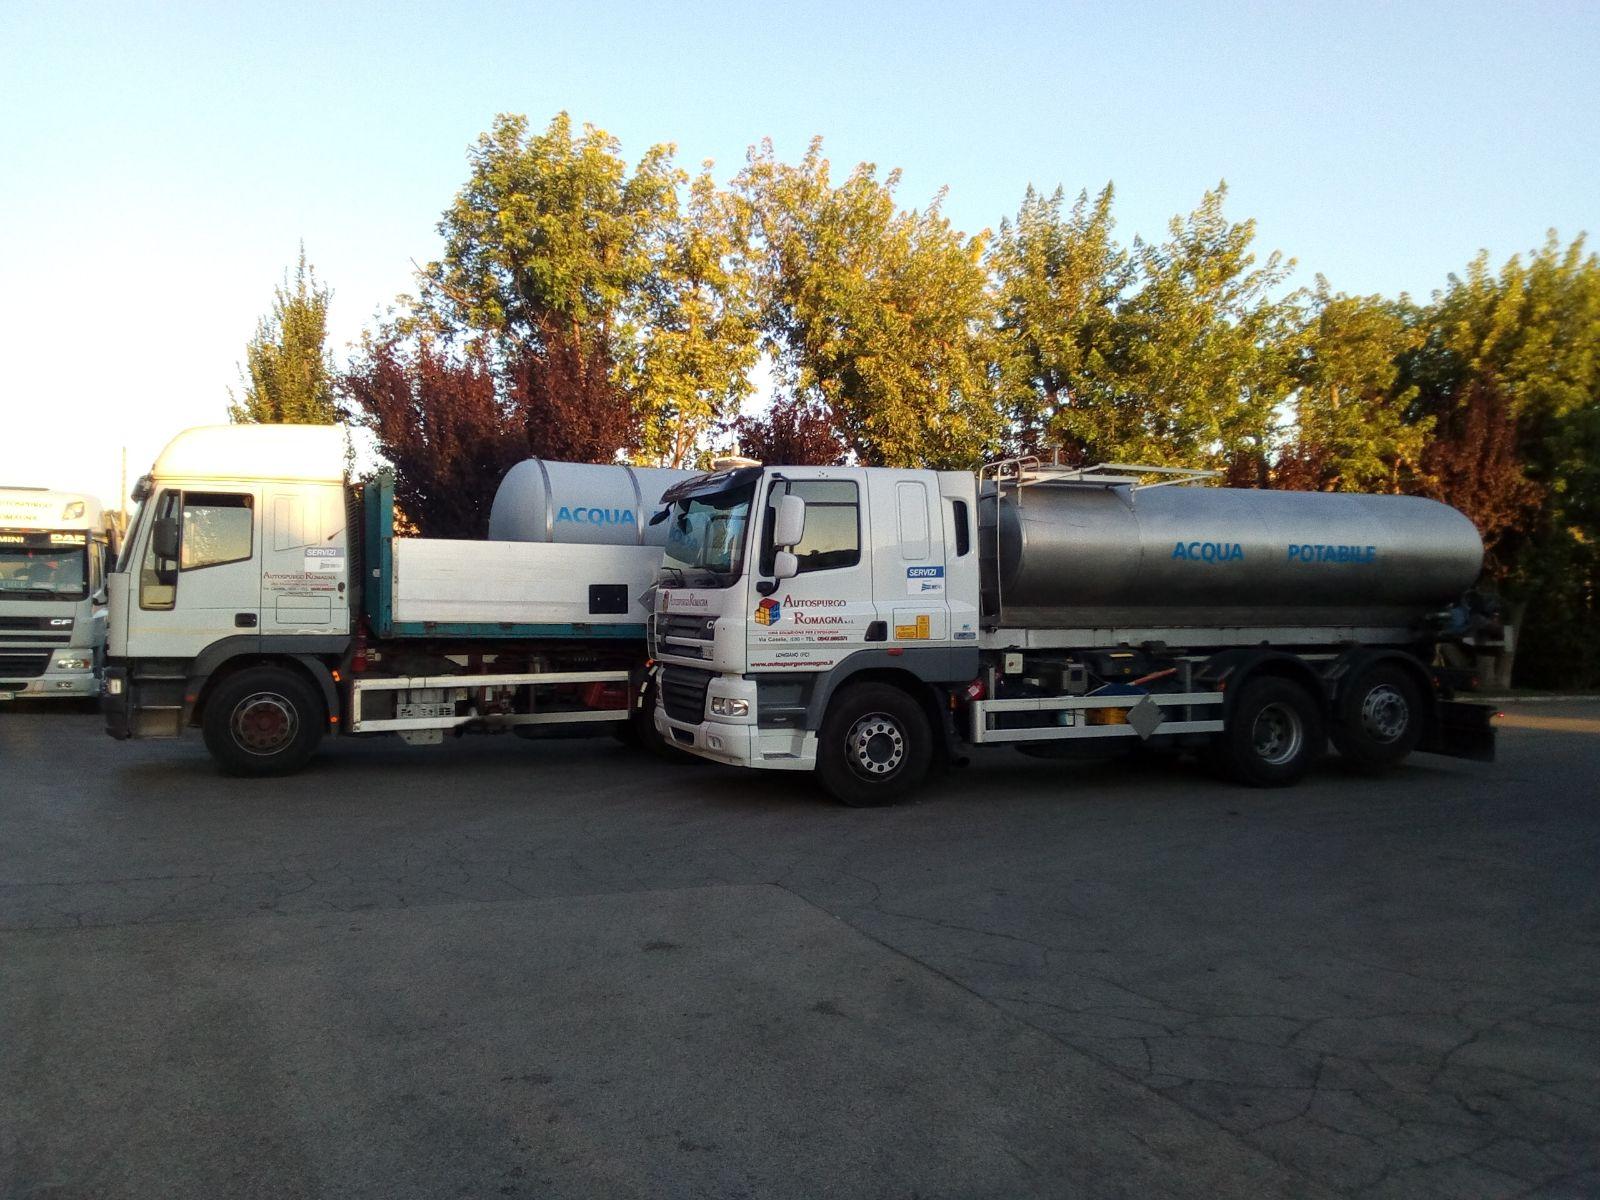 trasporto-acqua-potabile-cesena